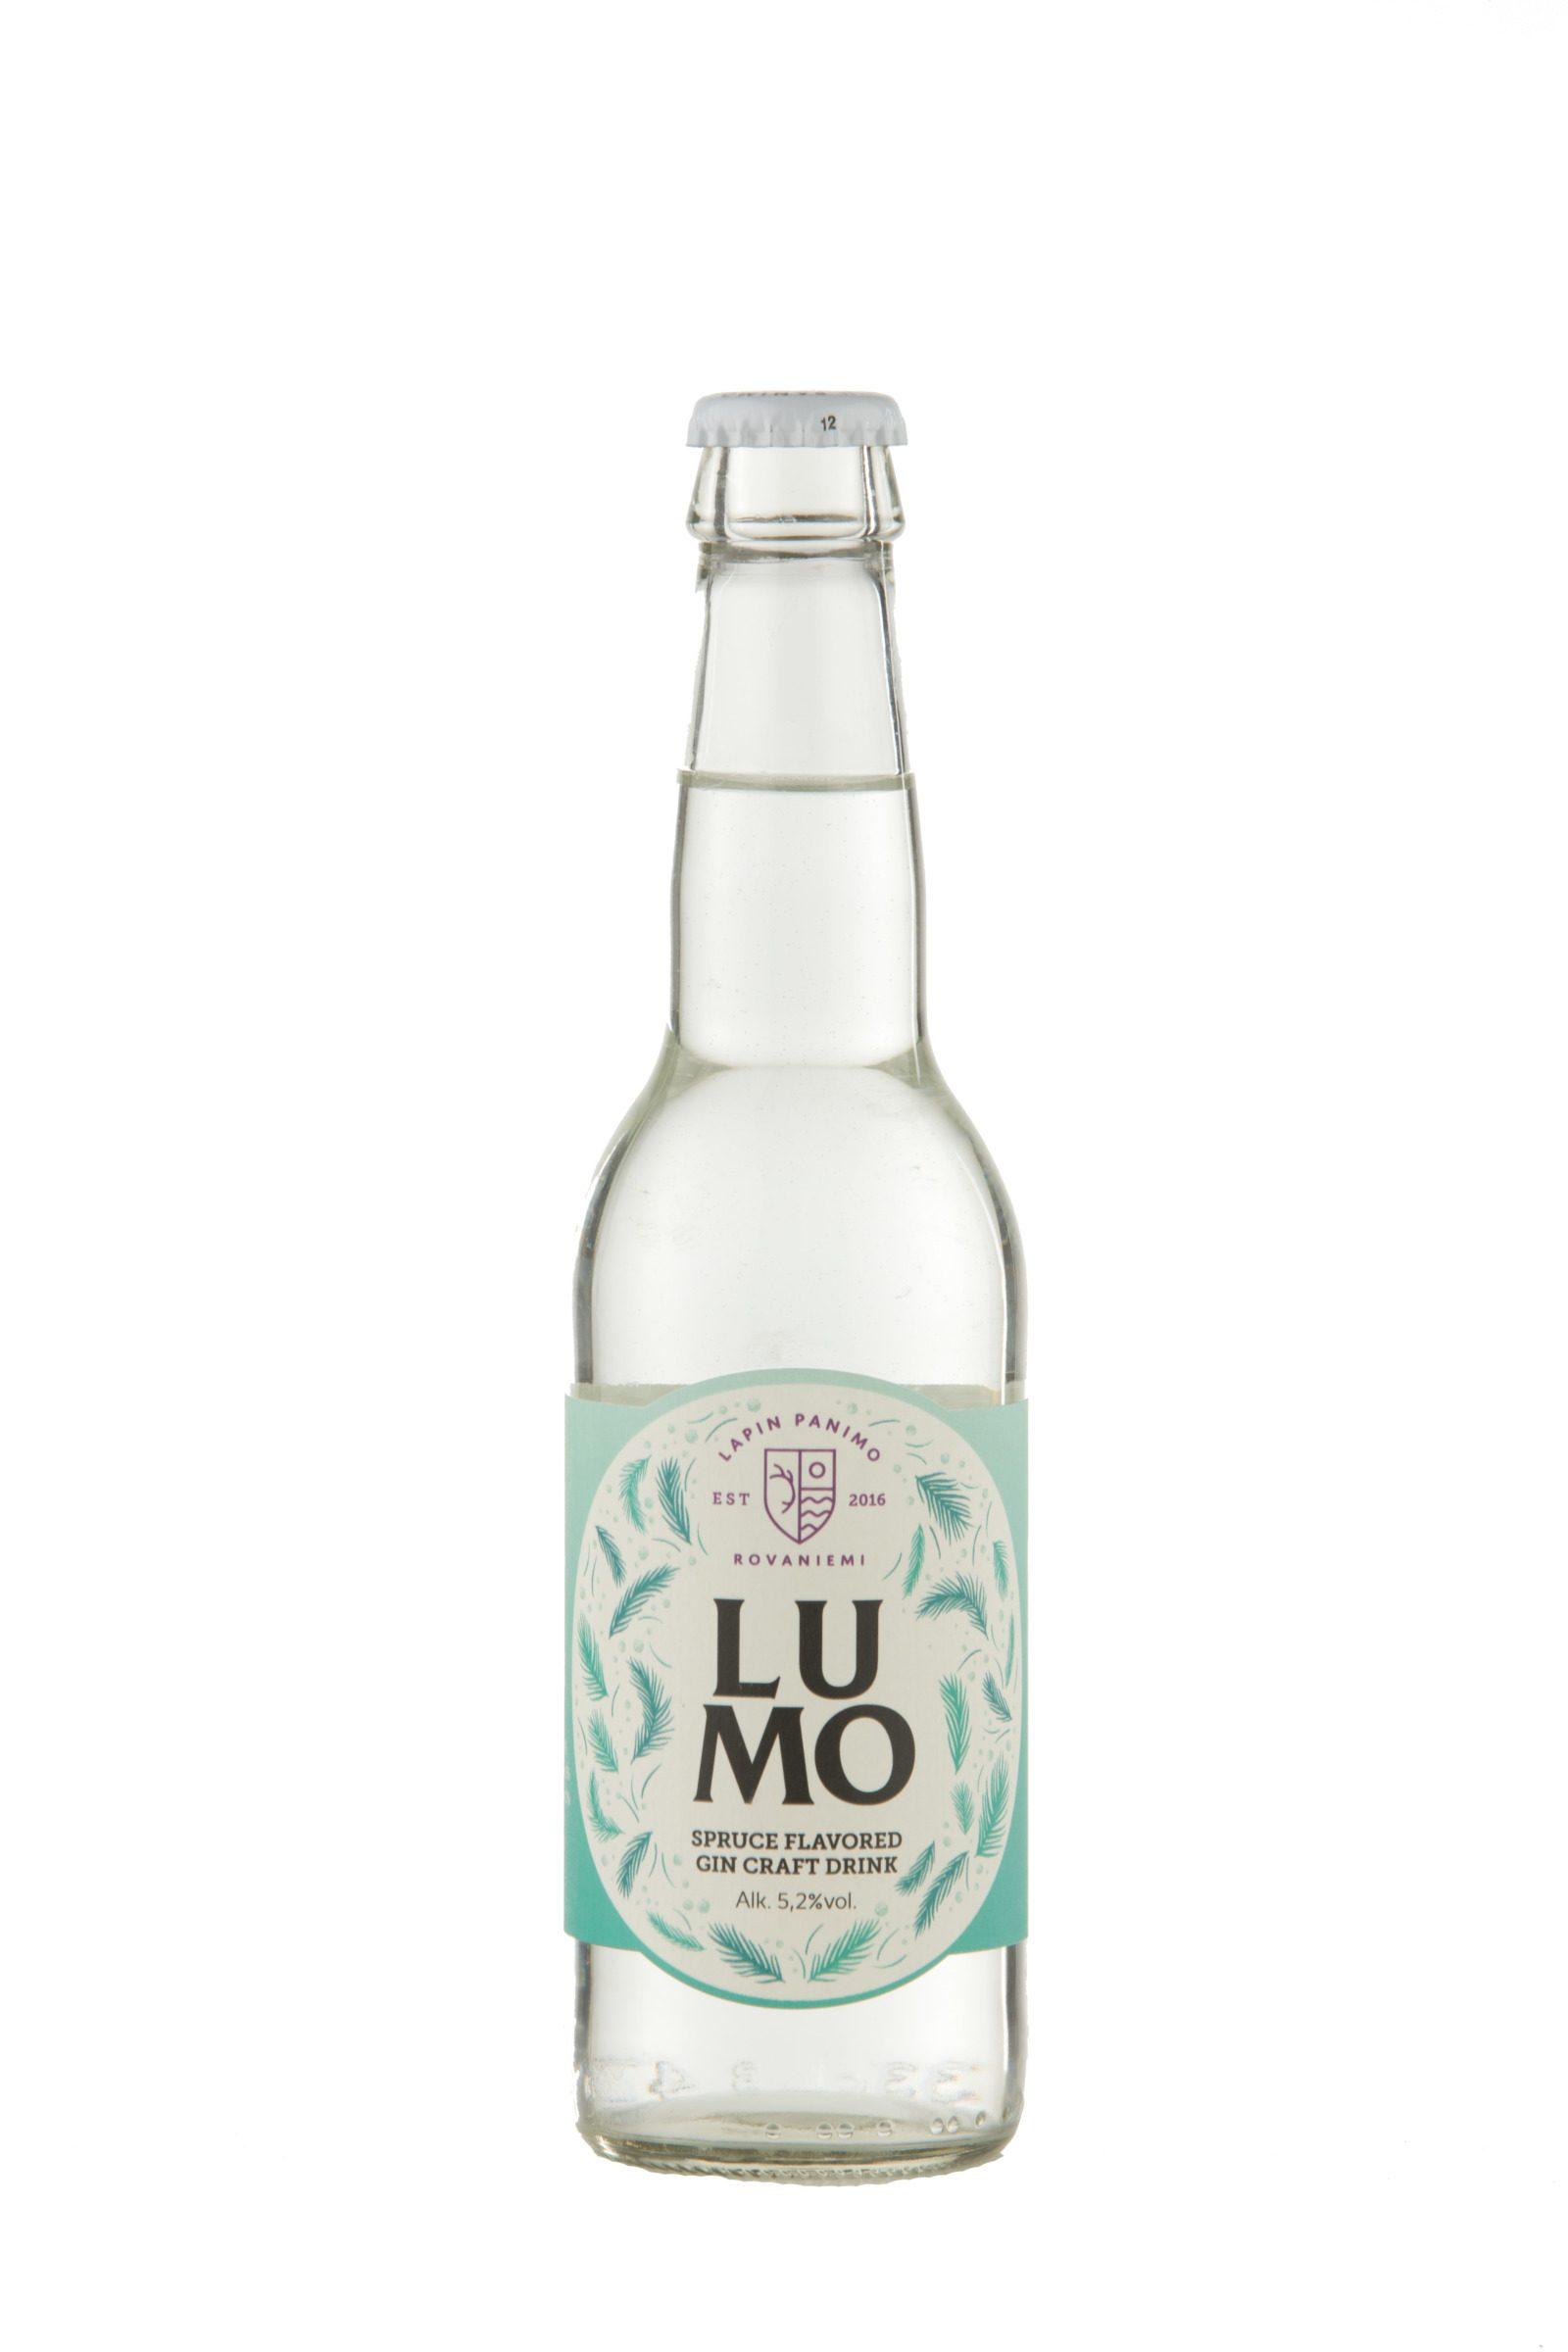 Lumo Spruce flavored GIN Craft Drink